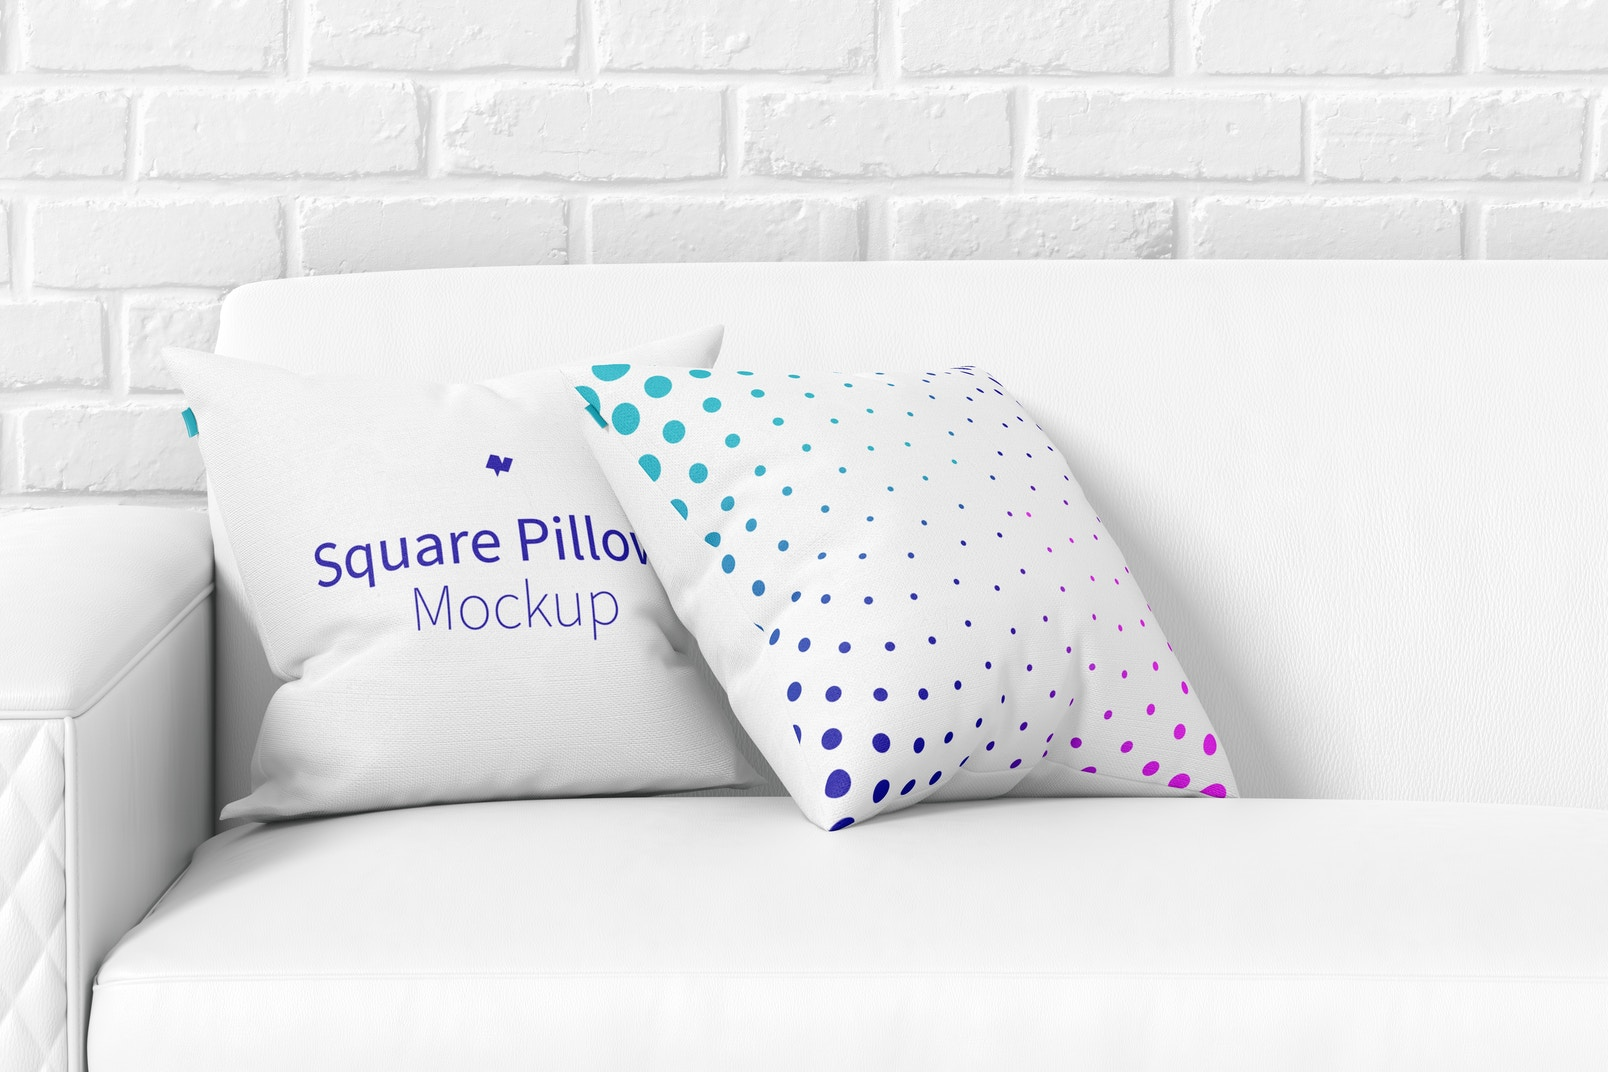 Square Pillows on the Sofa Mockup